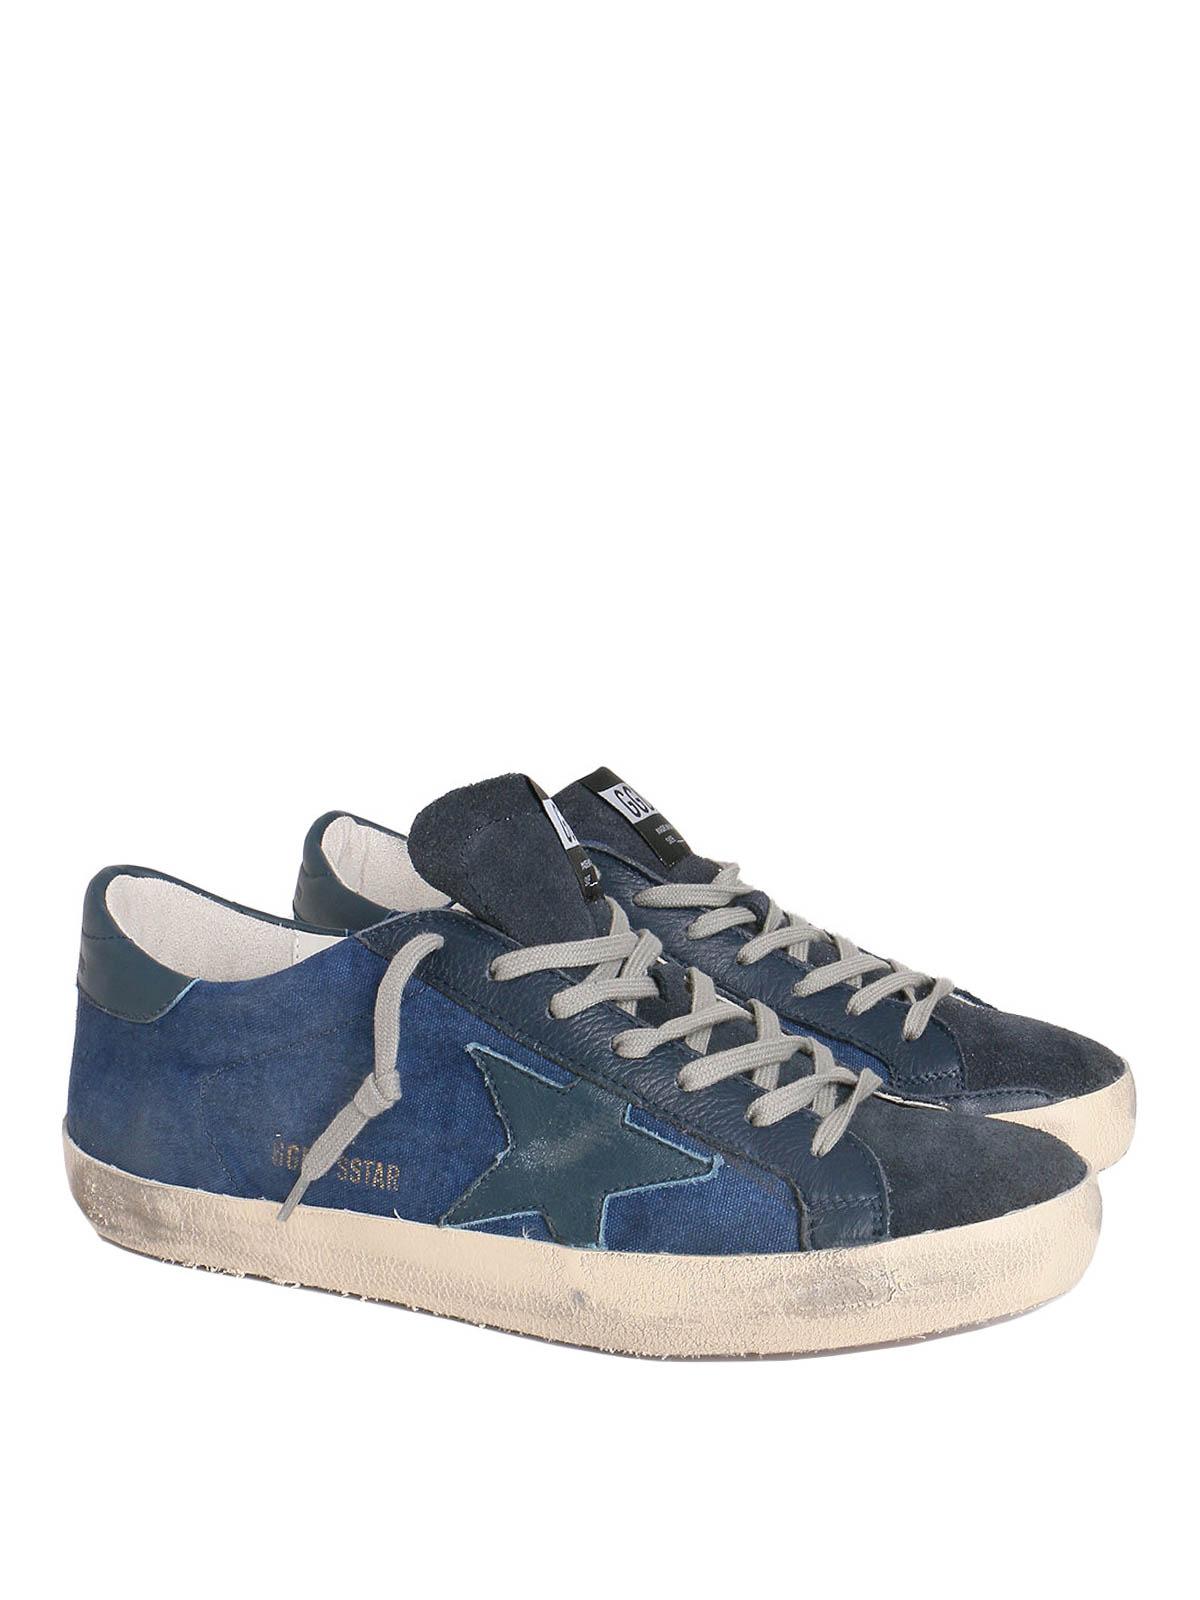 golden goose super star sneakers trainers g28ms590e45. Black Bedroom Furniture Sets. Home Design Ideas